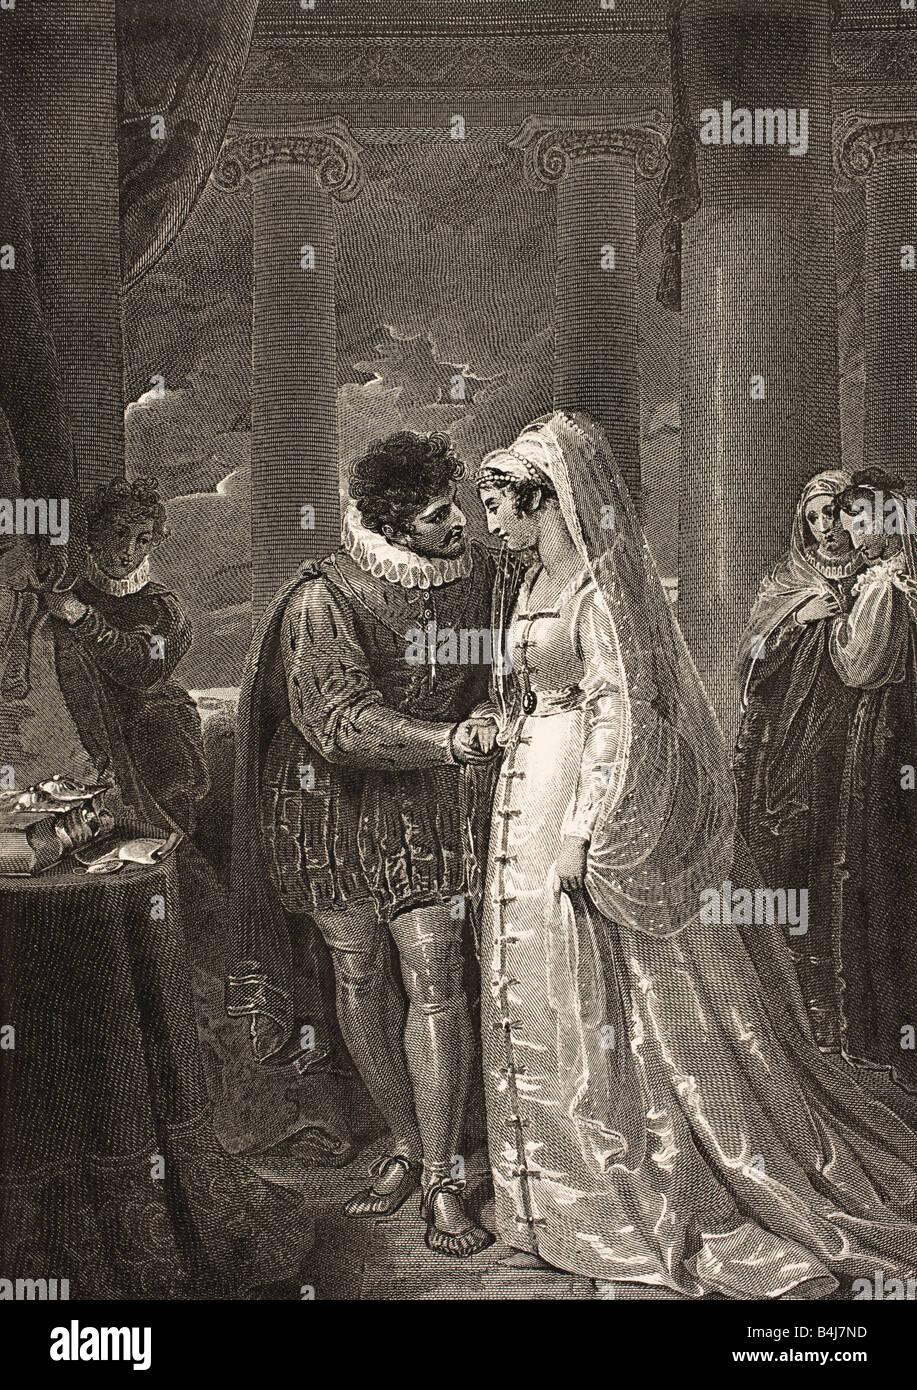 relationship between bassanio and portia